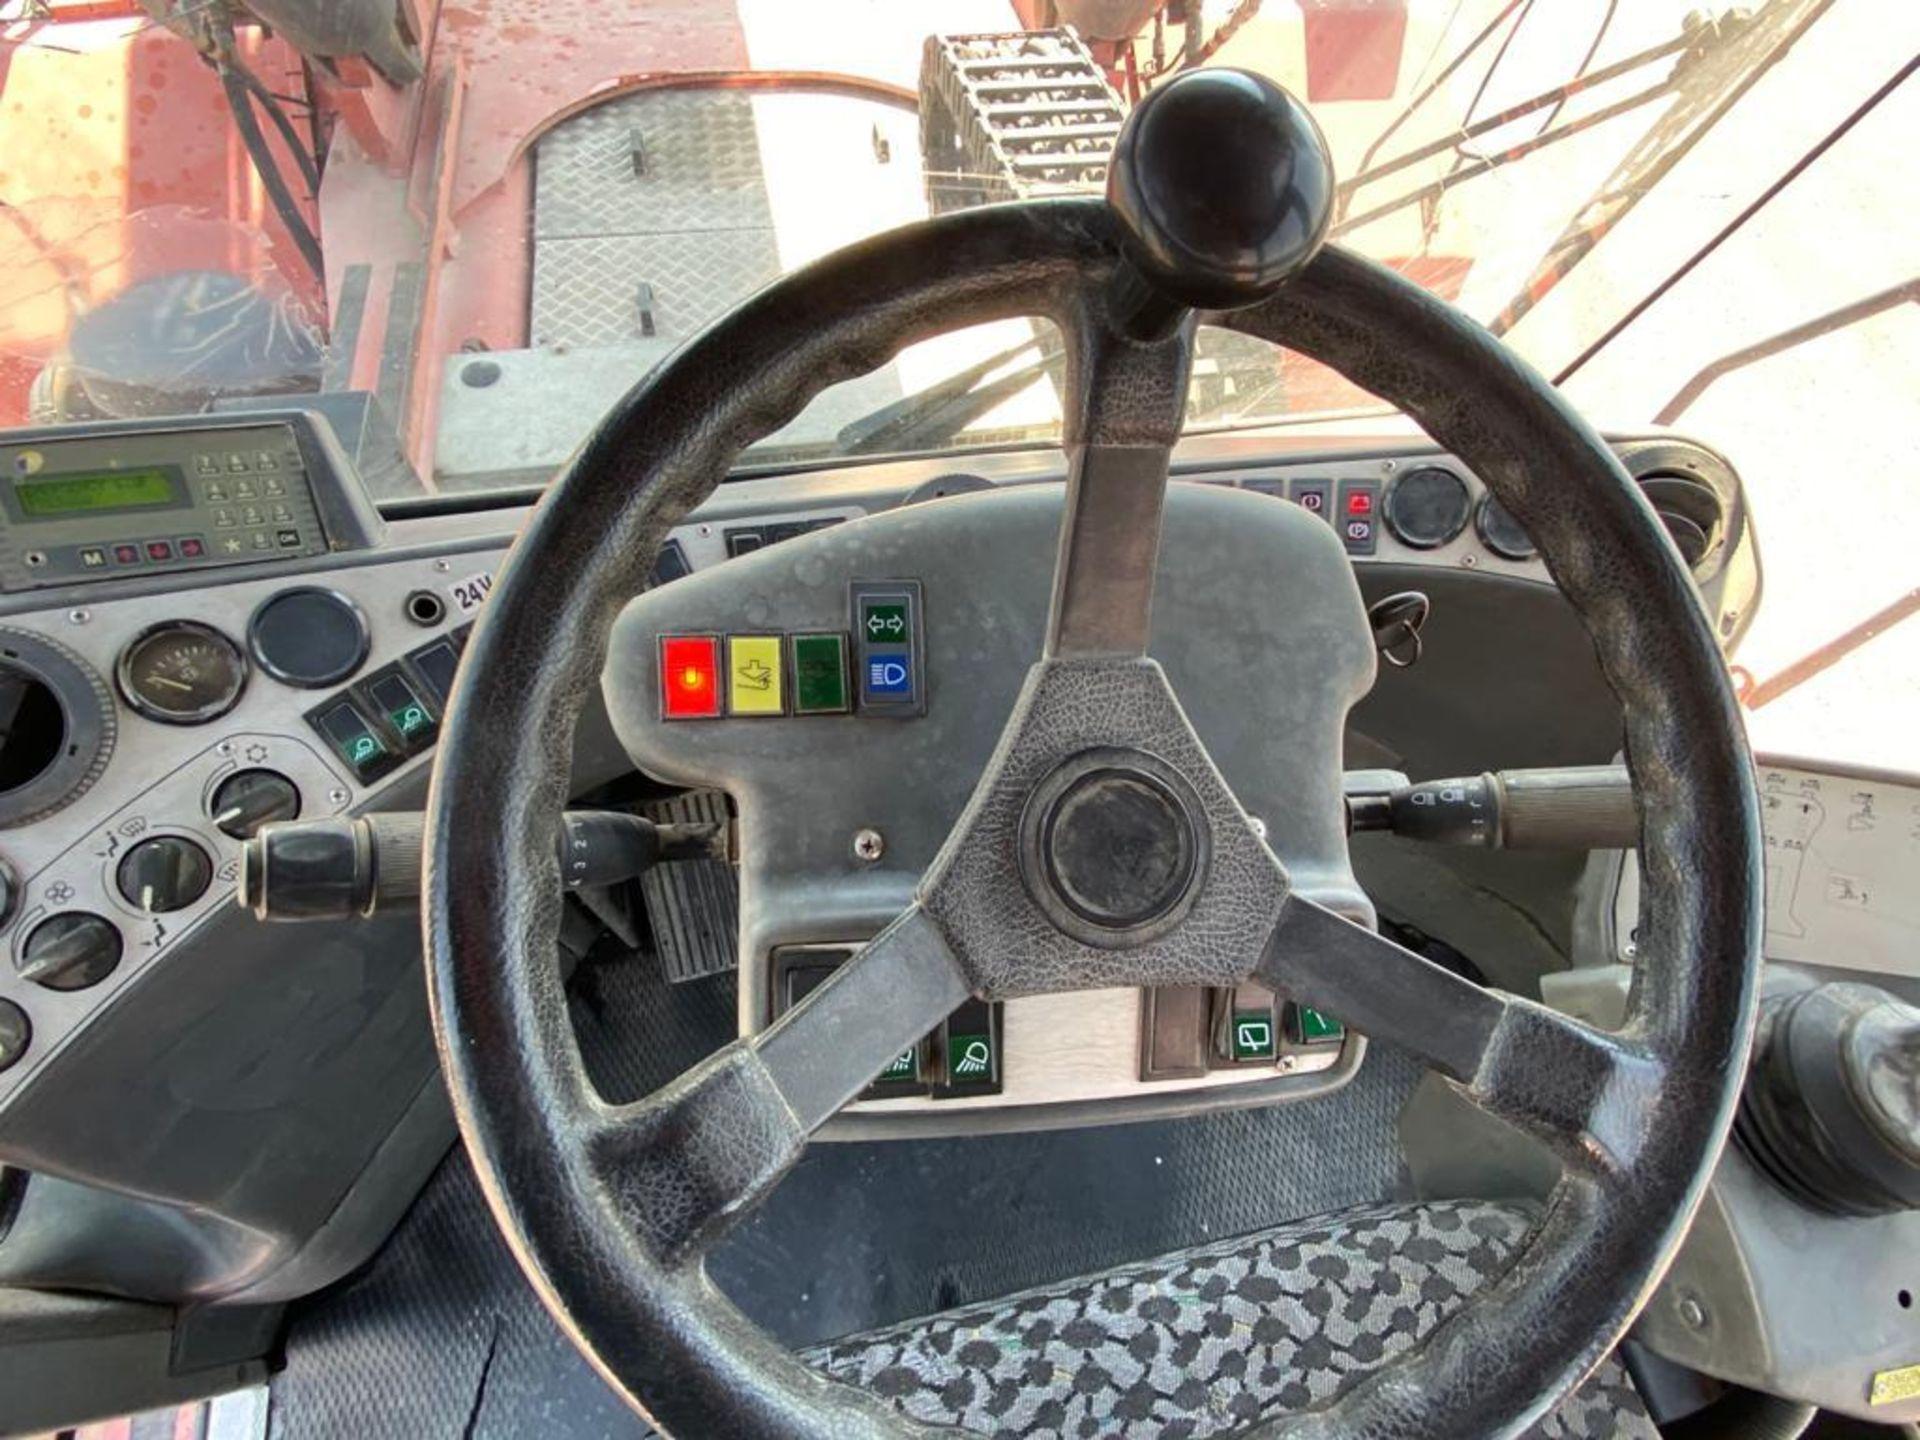 Reach Stacker marca Kalmar, año 2004, modelo DRS4531-55, No de serie T341140079 - Image 45 of 57